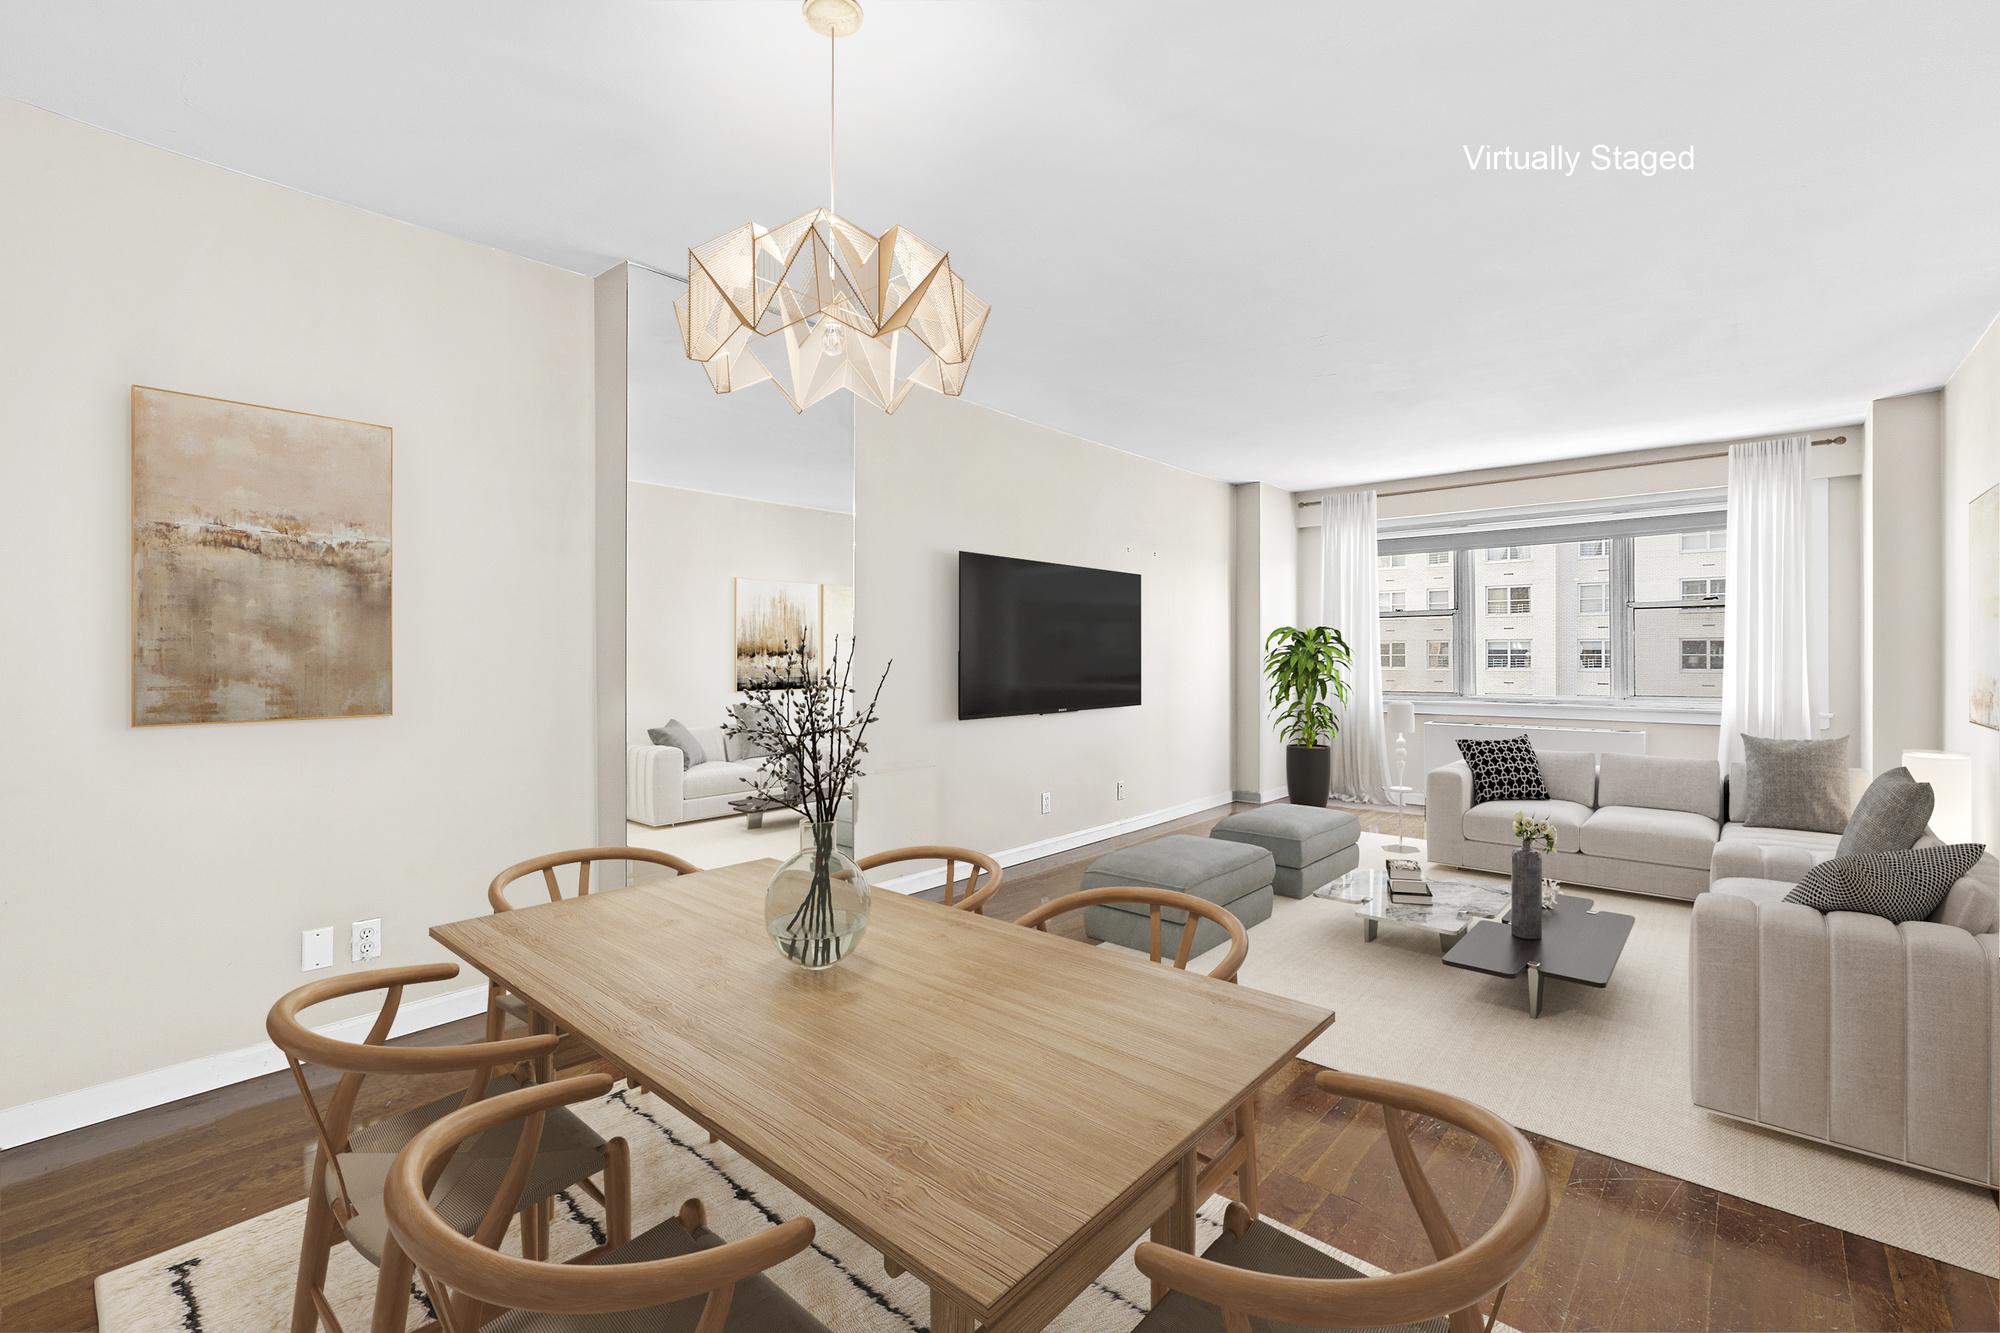 520 East 76th Street Upper East Side New York NY 10021